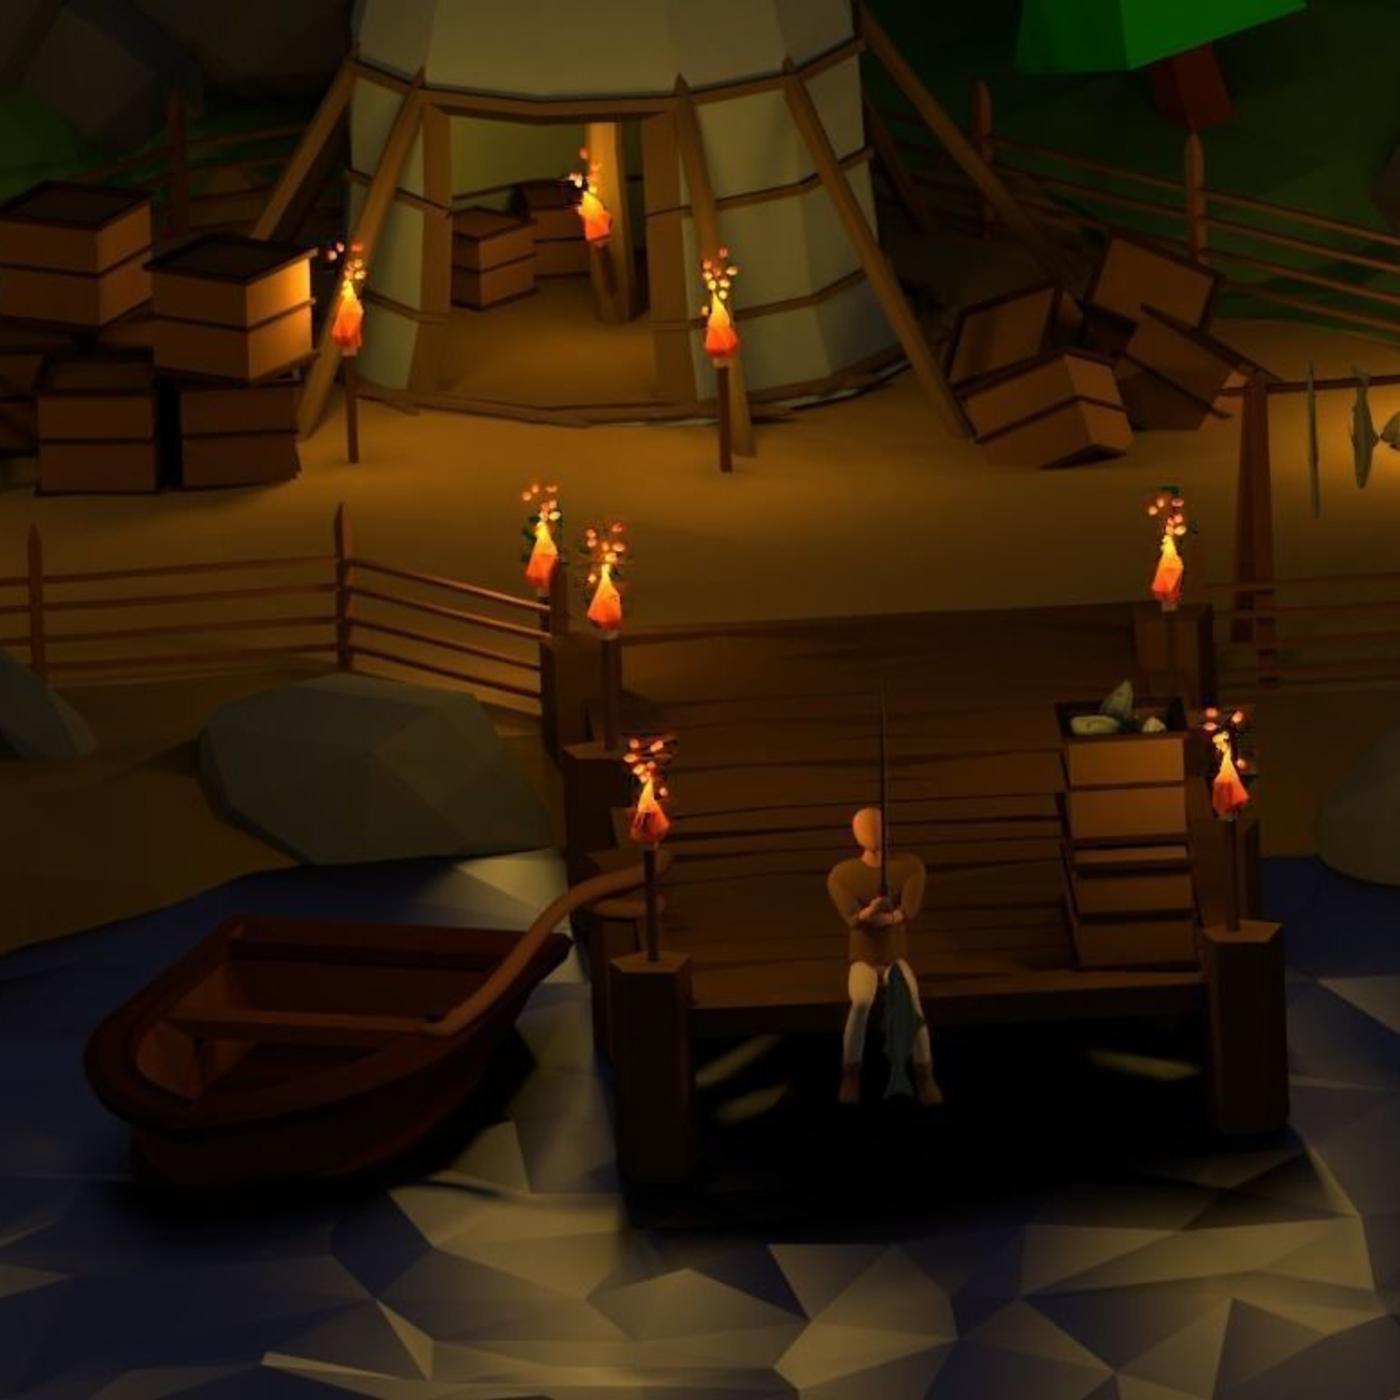 Fishermans Village